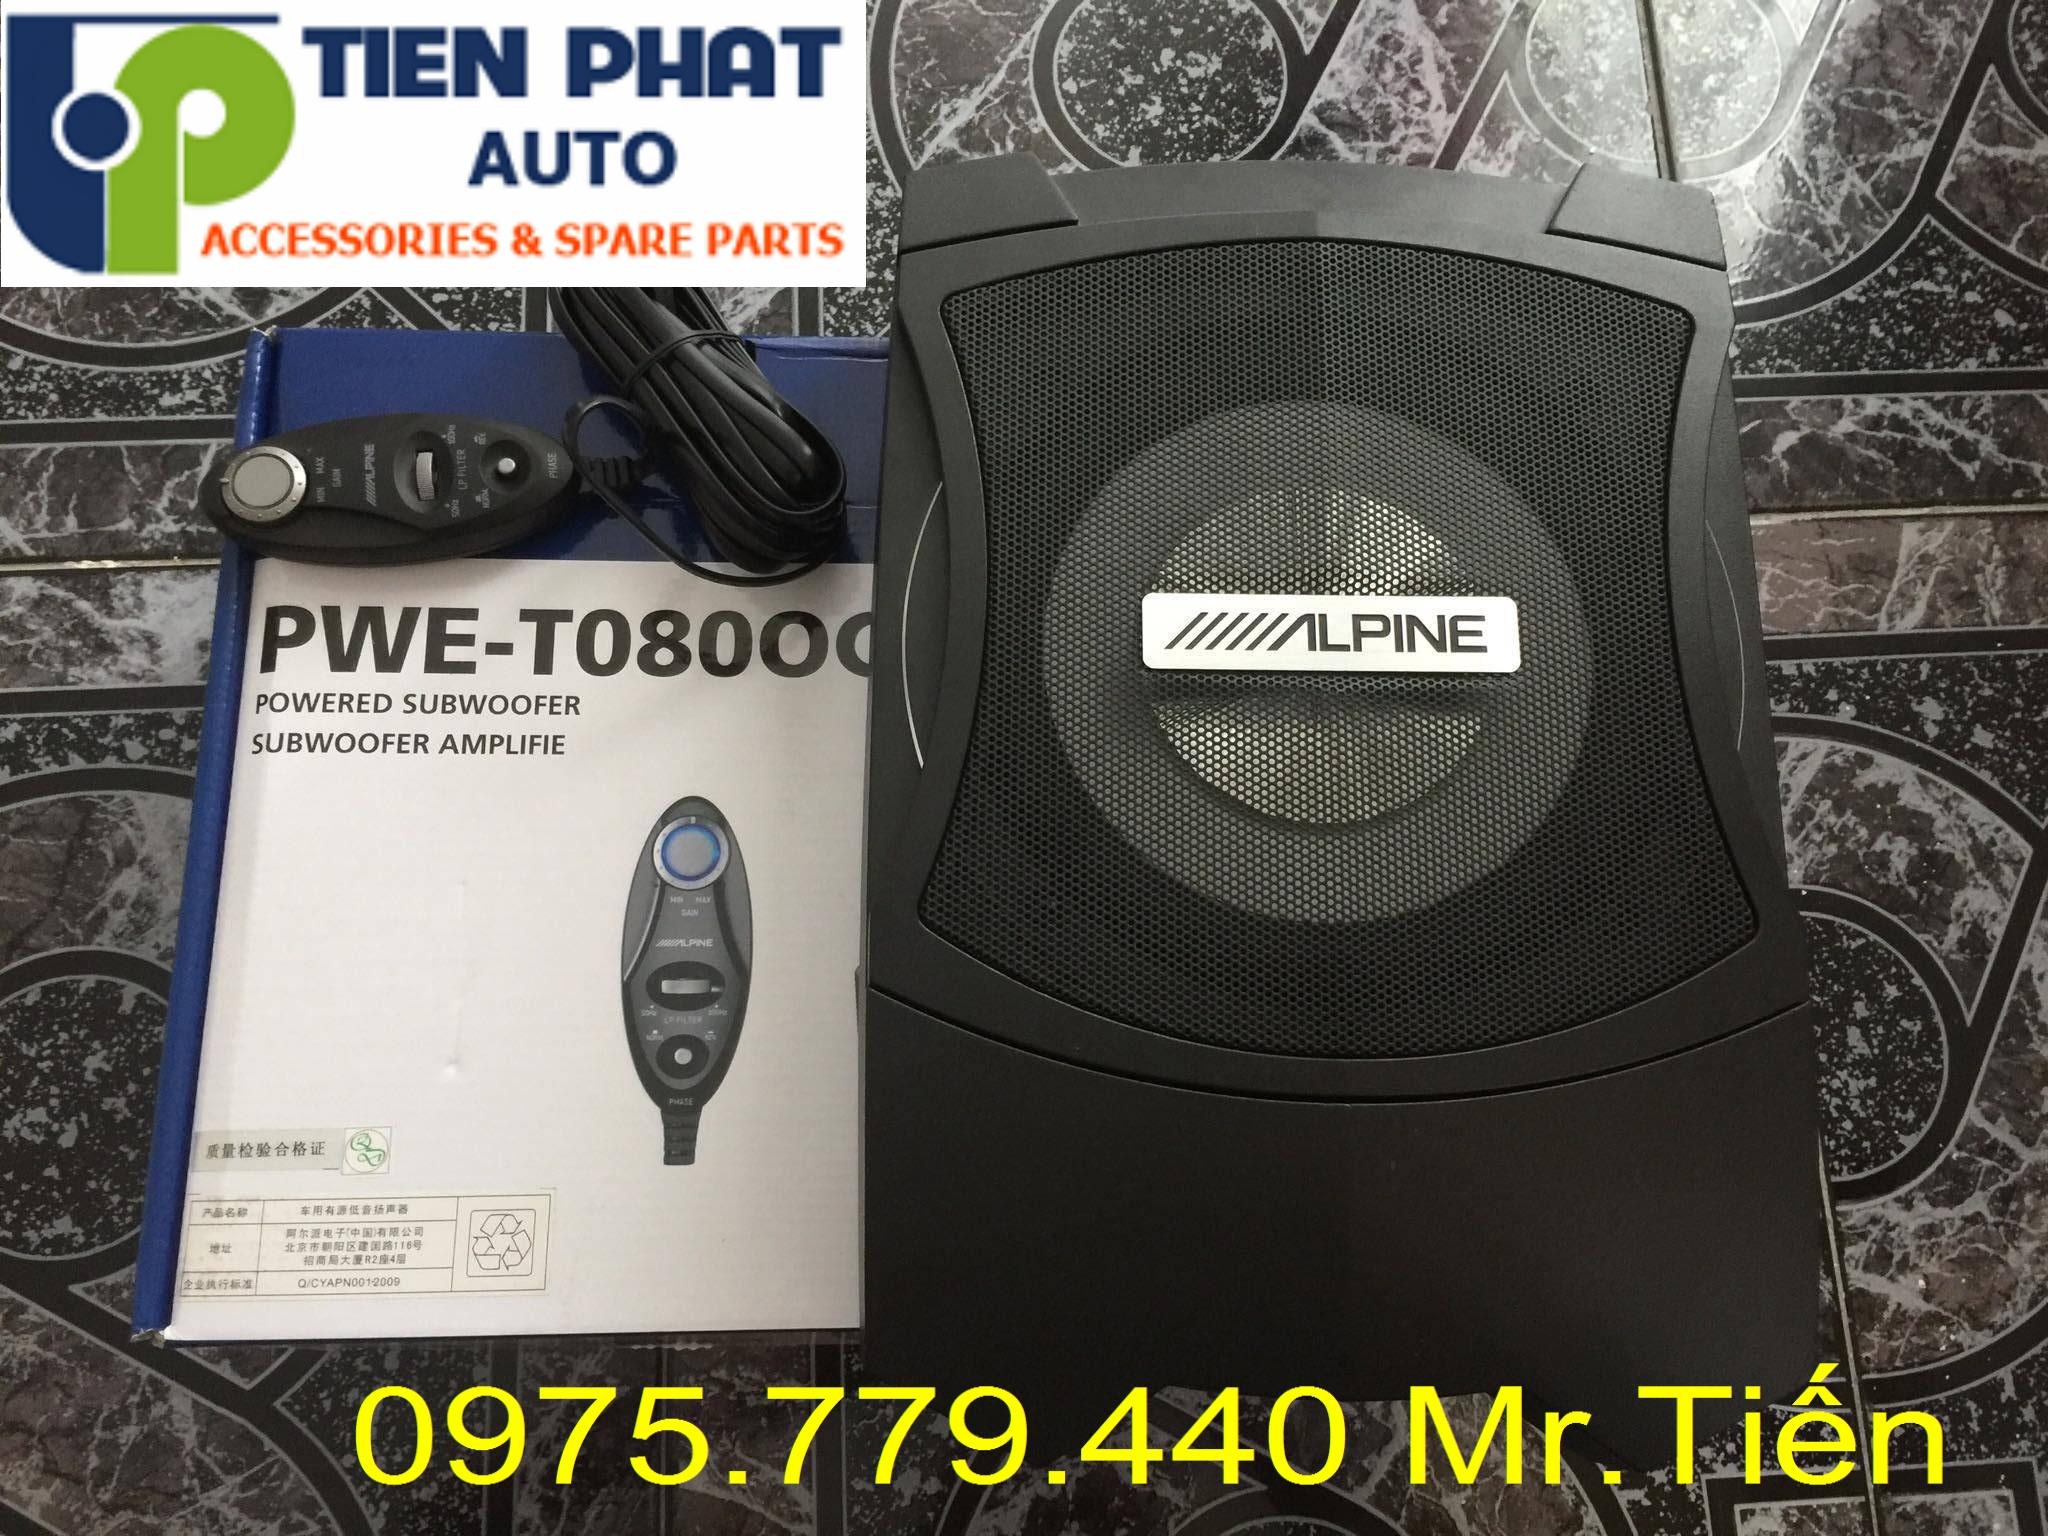 Lắp Loa sub Alpine PWE-T0800C cho Toyota Sienna Lắp Đặt Tận Nơi